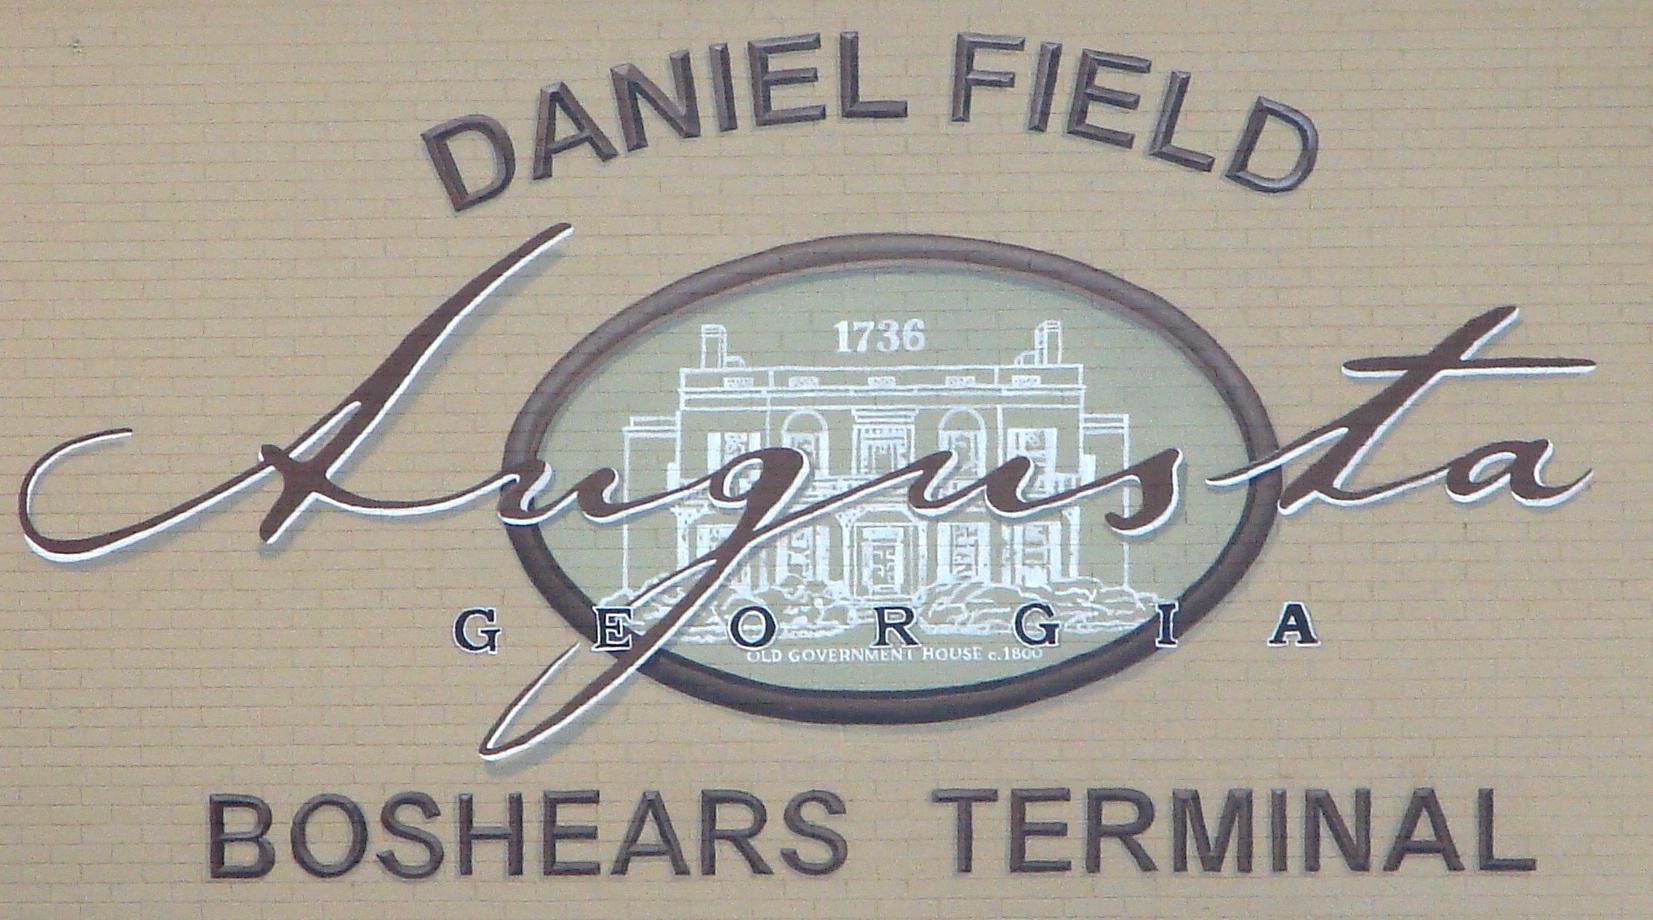 Daniel Field Boshears Terminal